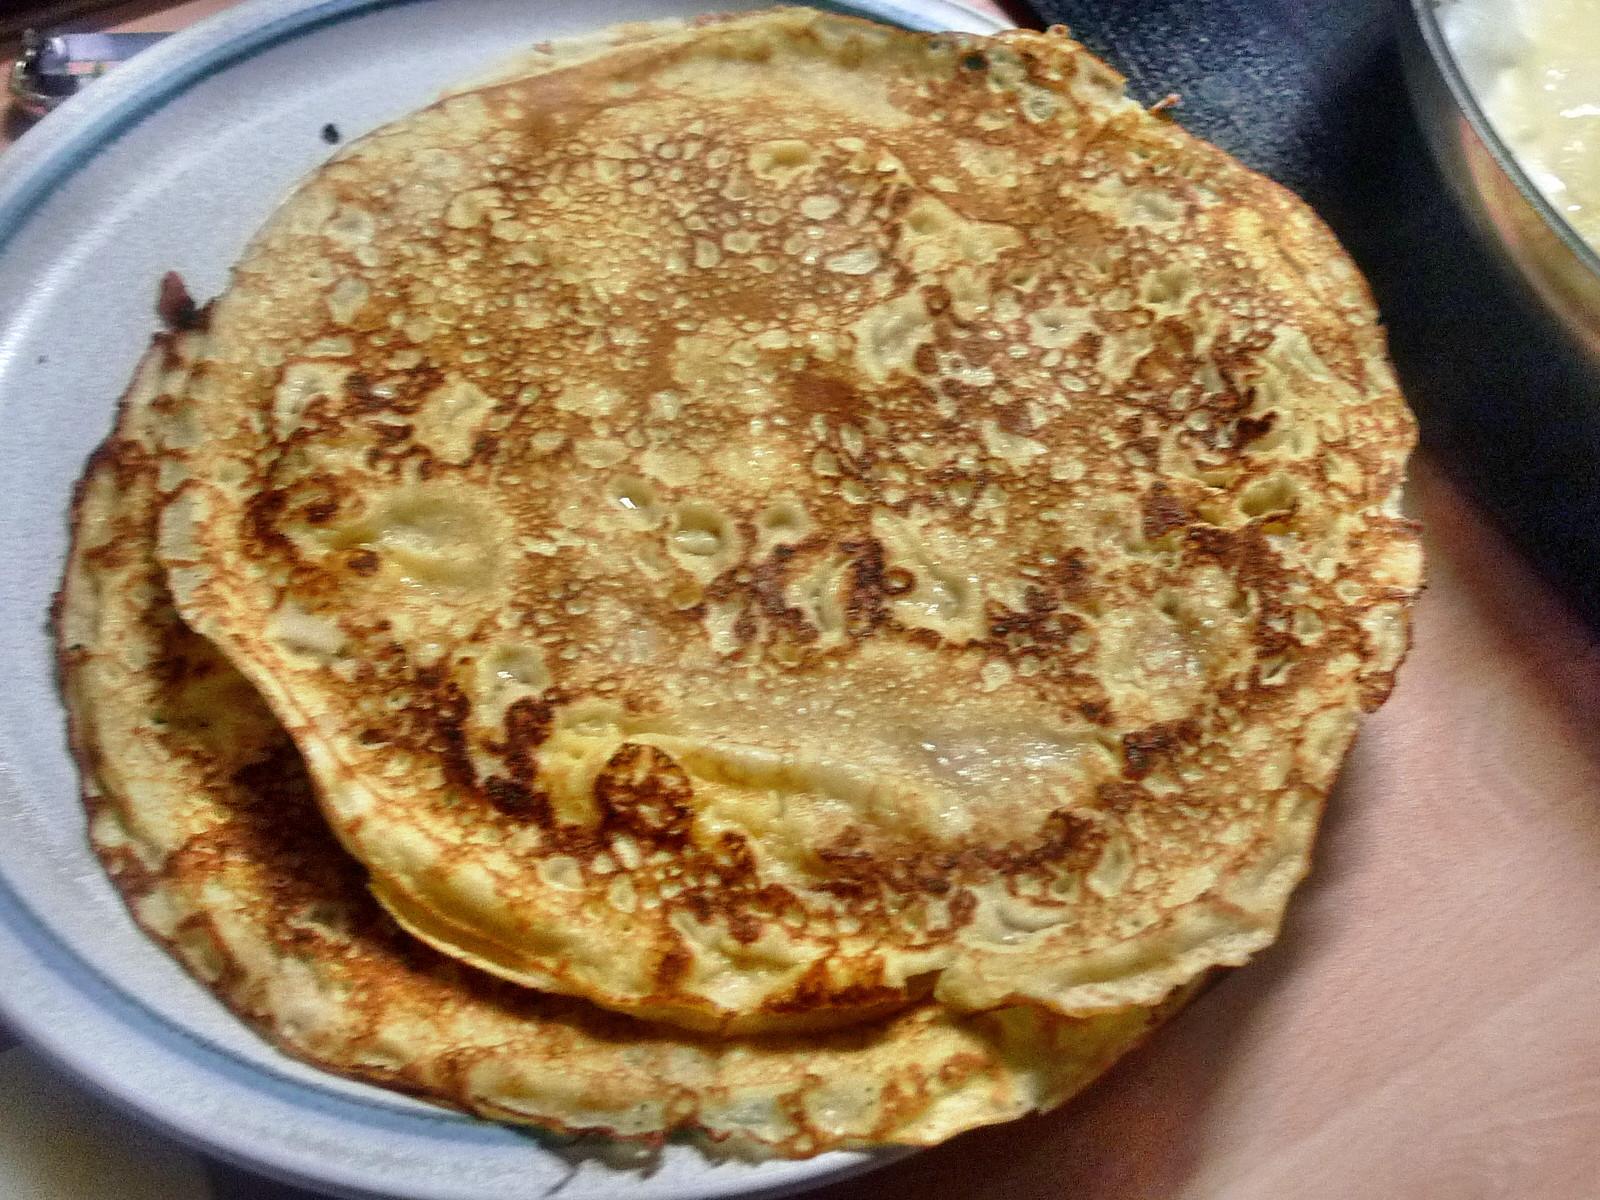 Crepe-Pilze-Salate-24.8.14   (11)